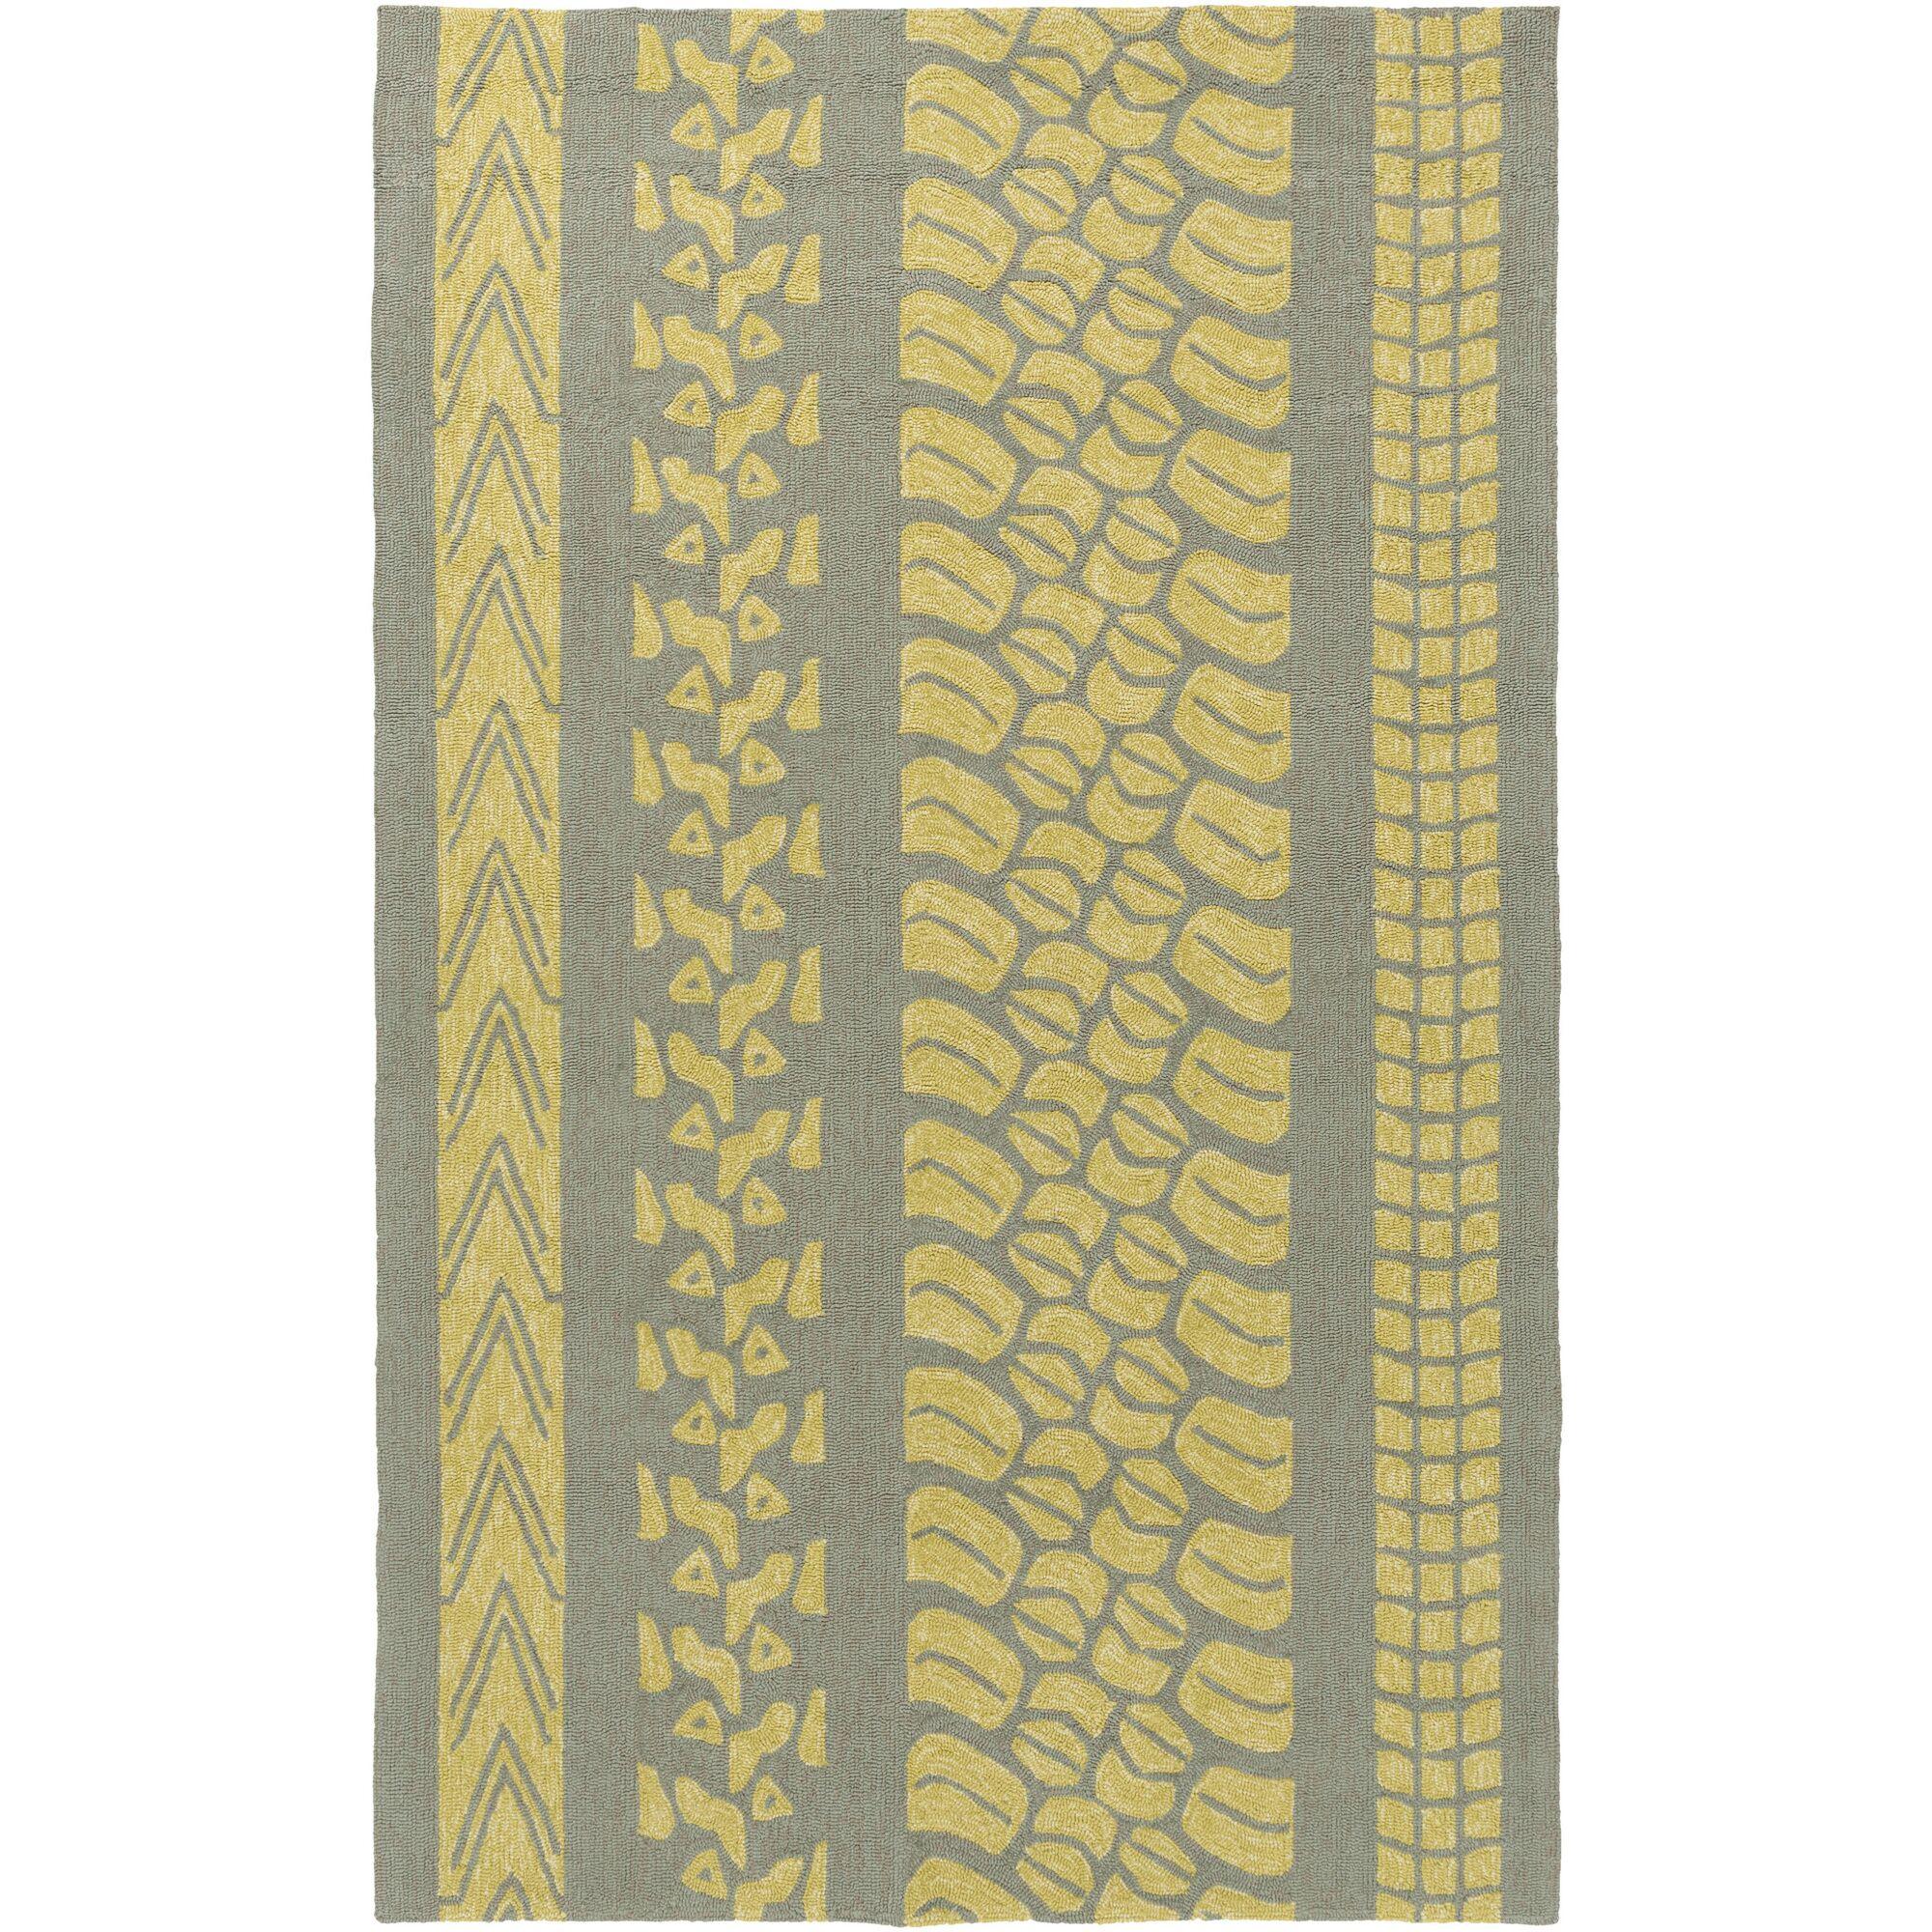 Boles Gold/Moss Indoor/Outdoor Area Rug Rug Size: Rectangle 9' x 12'